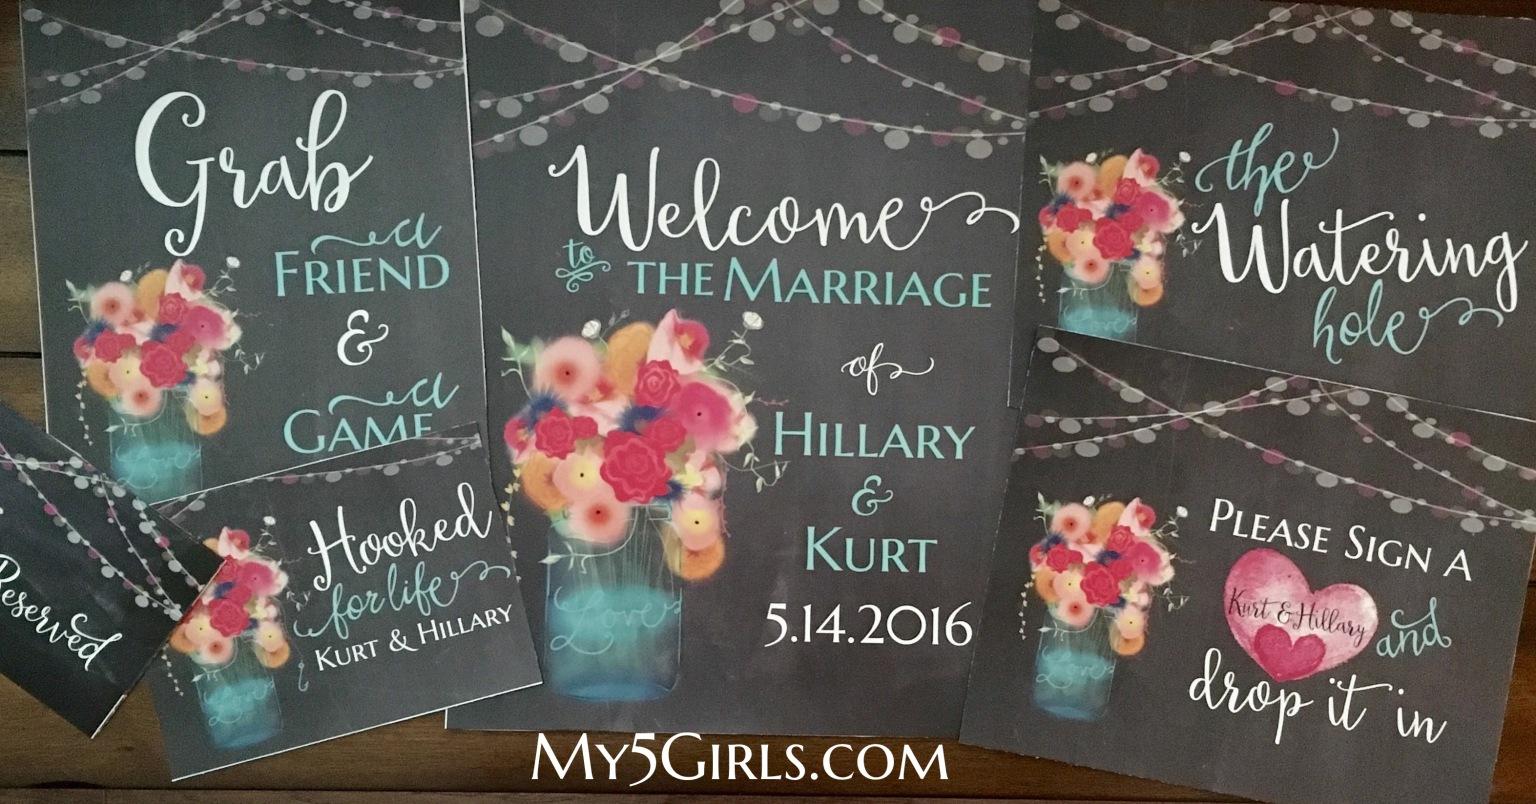 Wedding Sinage to match invitations